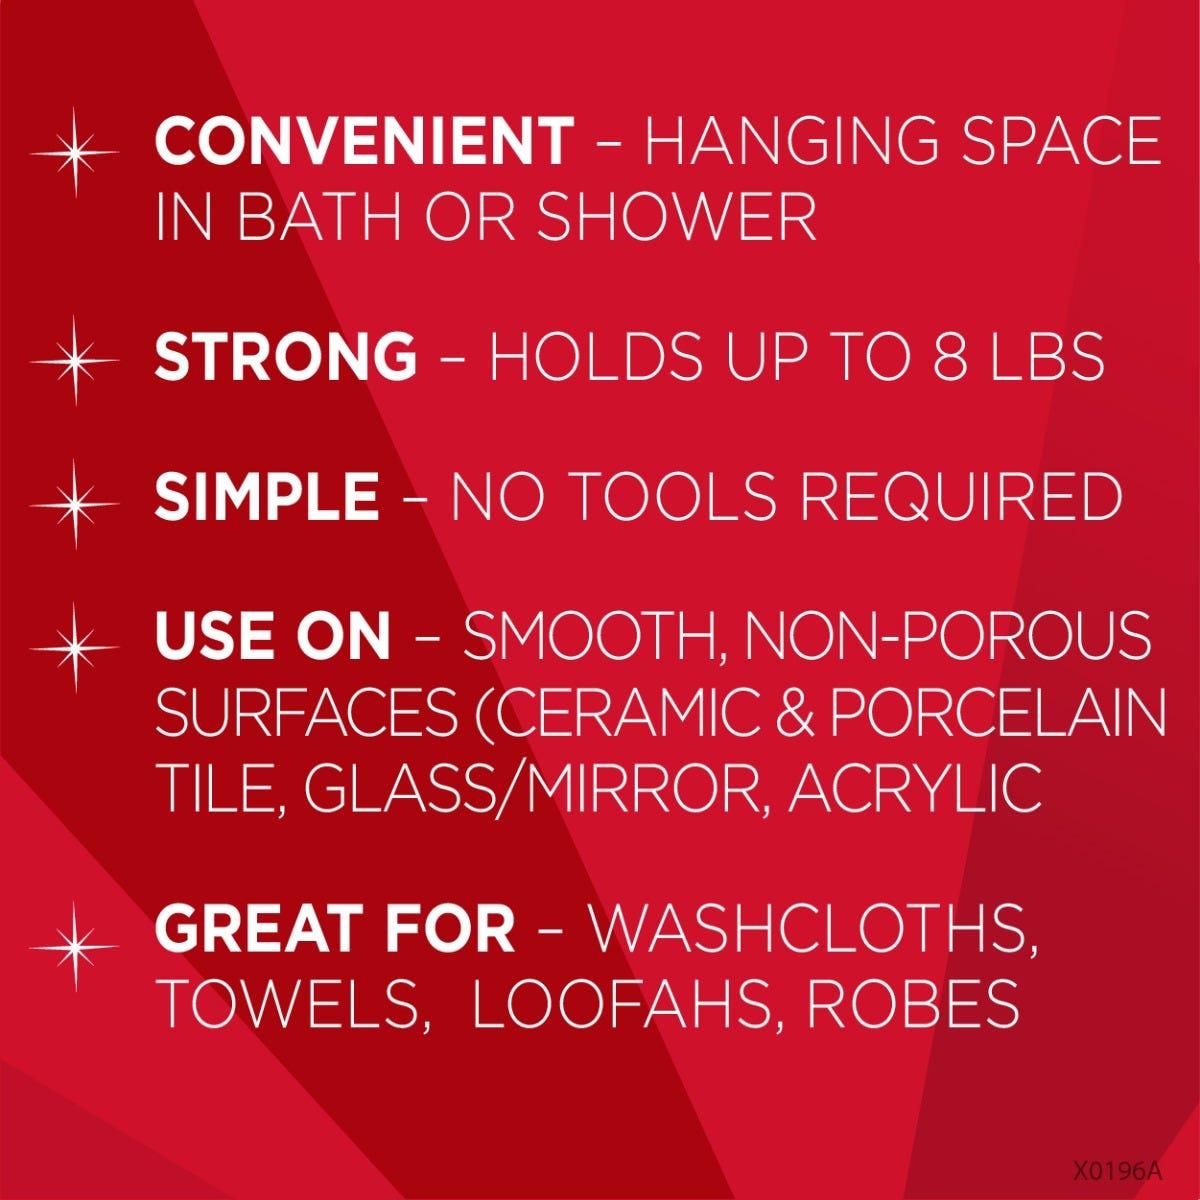 https://googone.com/media/catalog/product/s/u/suction_shower_hook_benefits.jpg